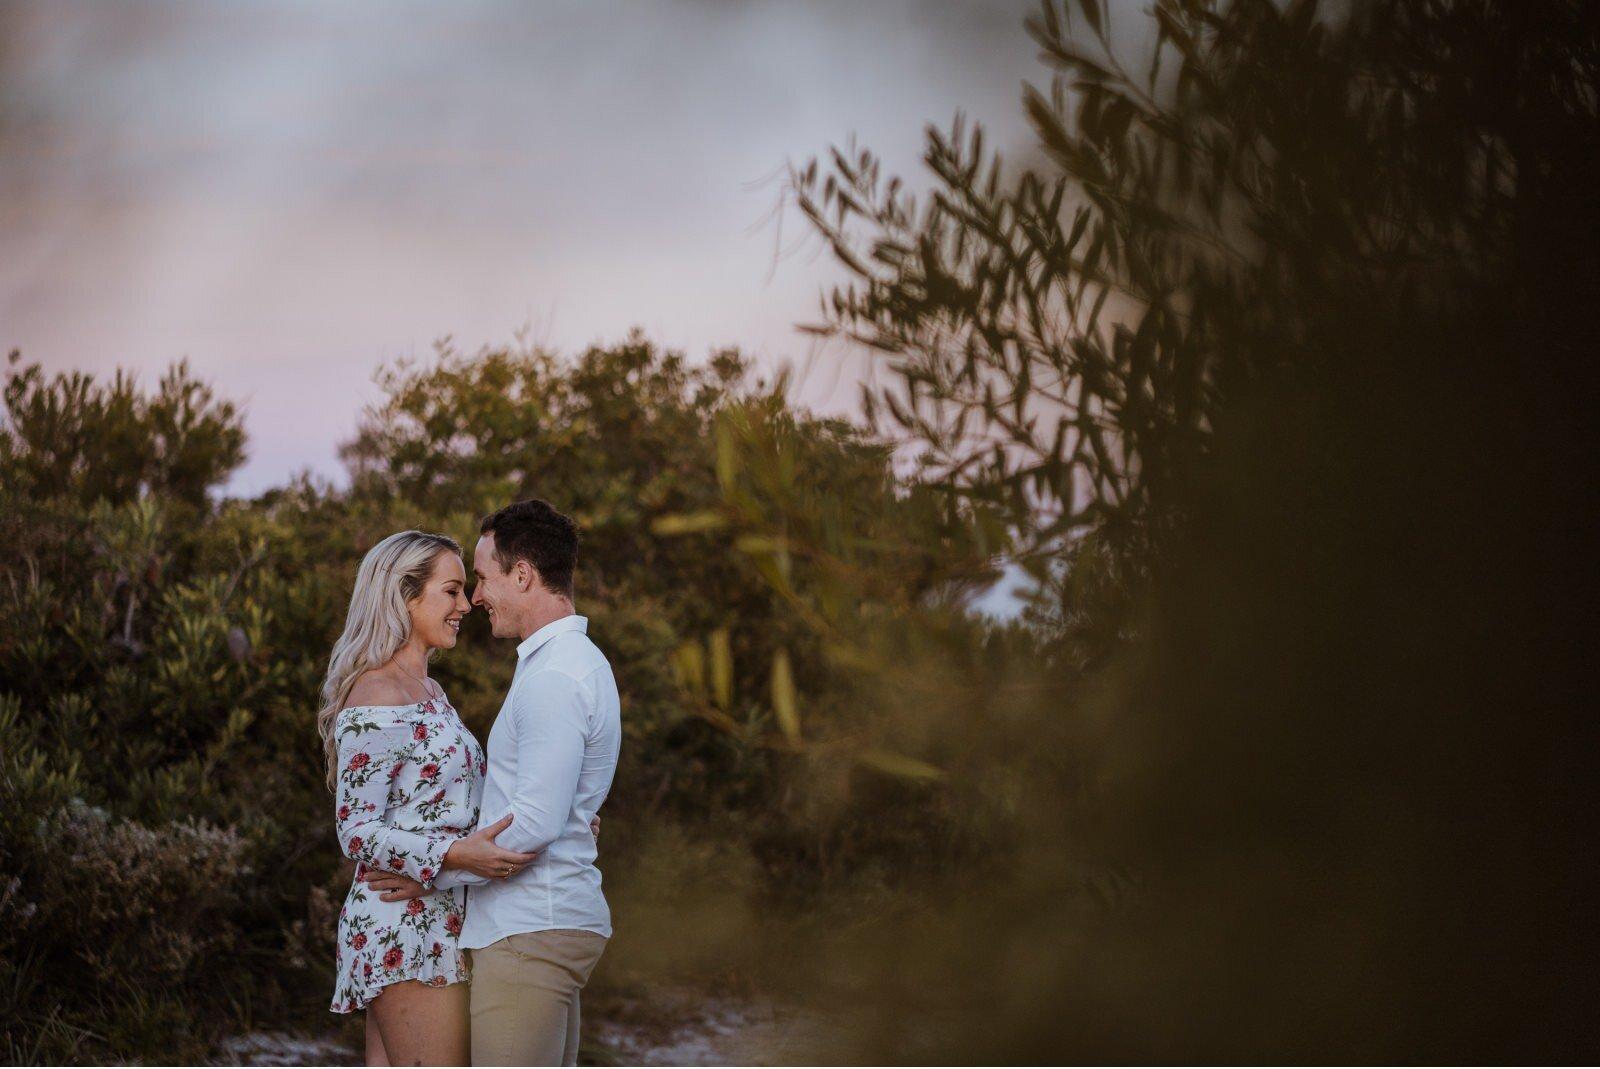 newcastle-wedding-photographer-dudley-engagement-shoot-20.jpg